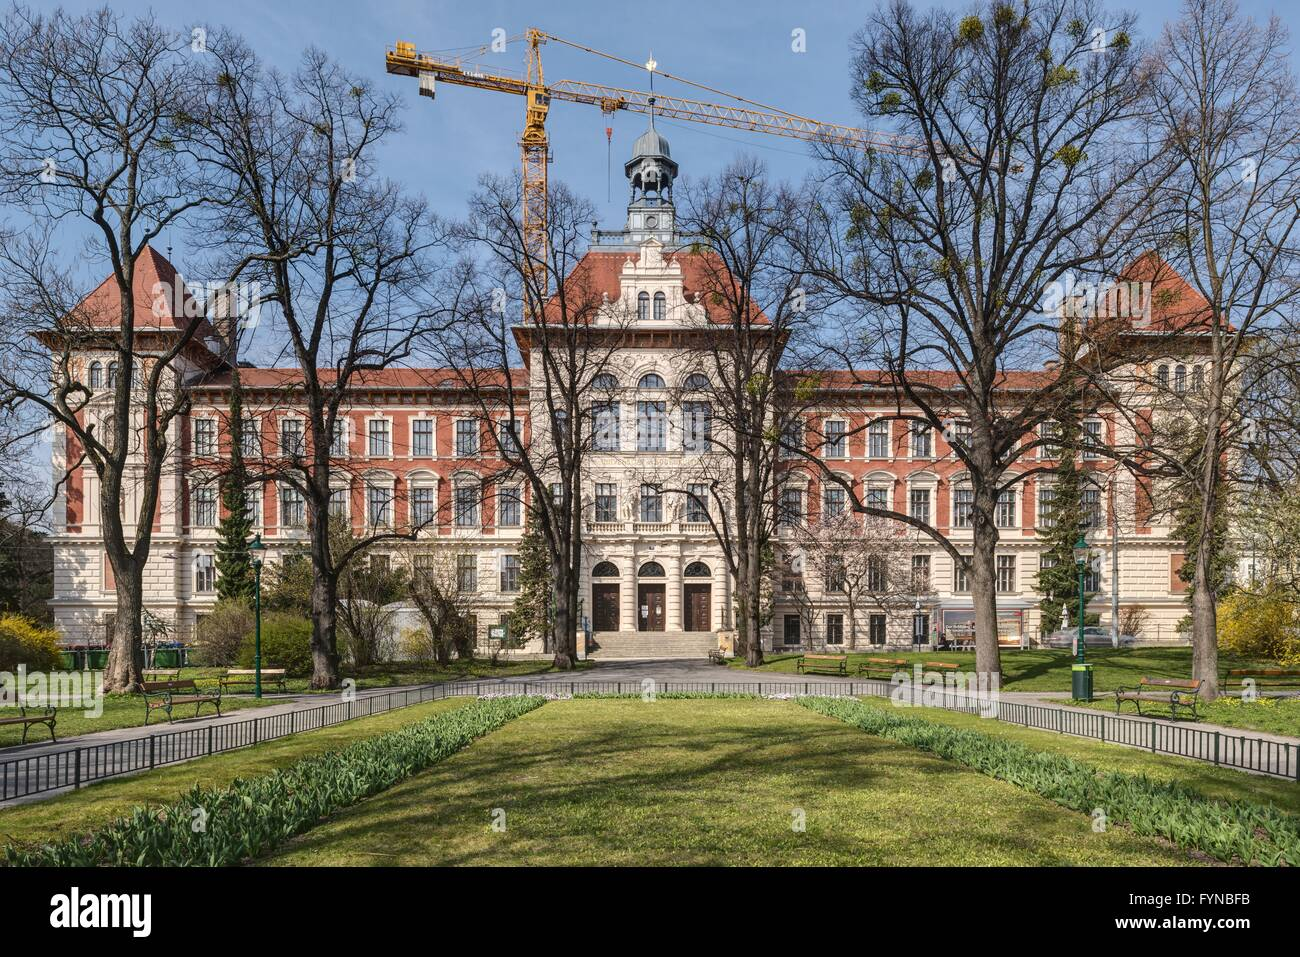 Wien, Universität für Bodenkultur (Boku), Gregor-Mendel-HausStock Photo